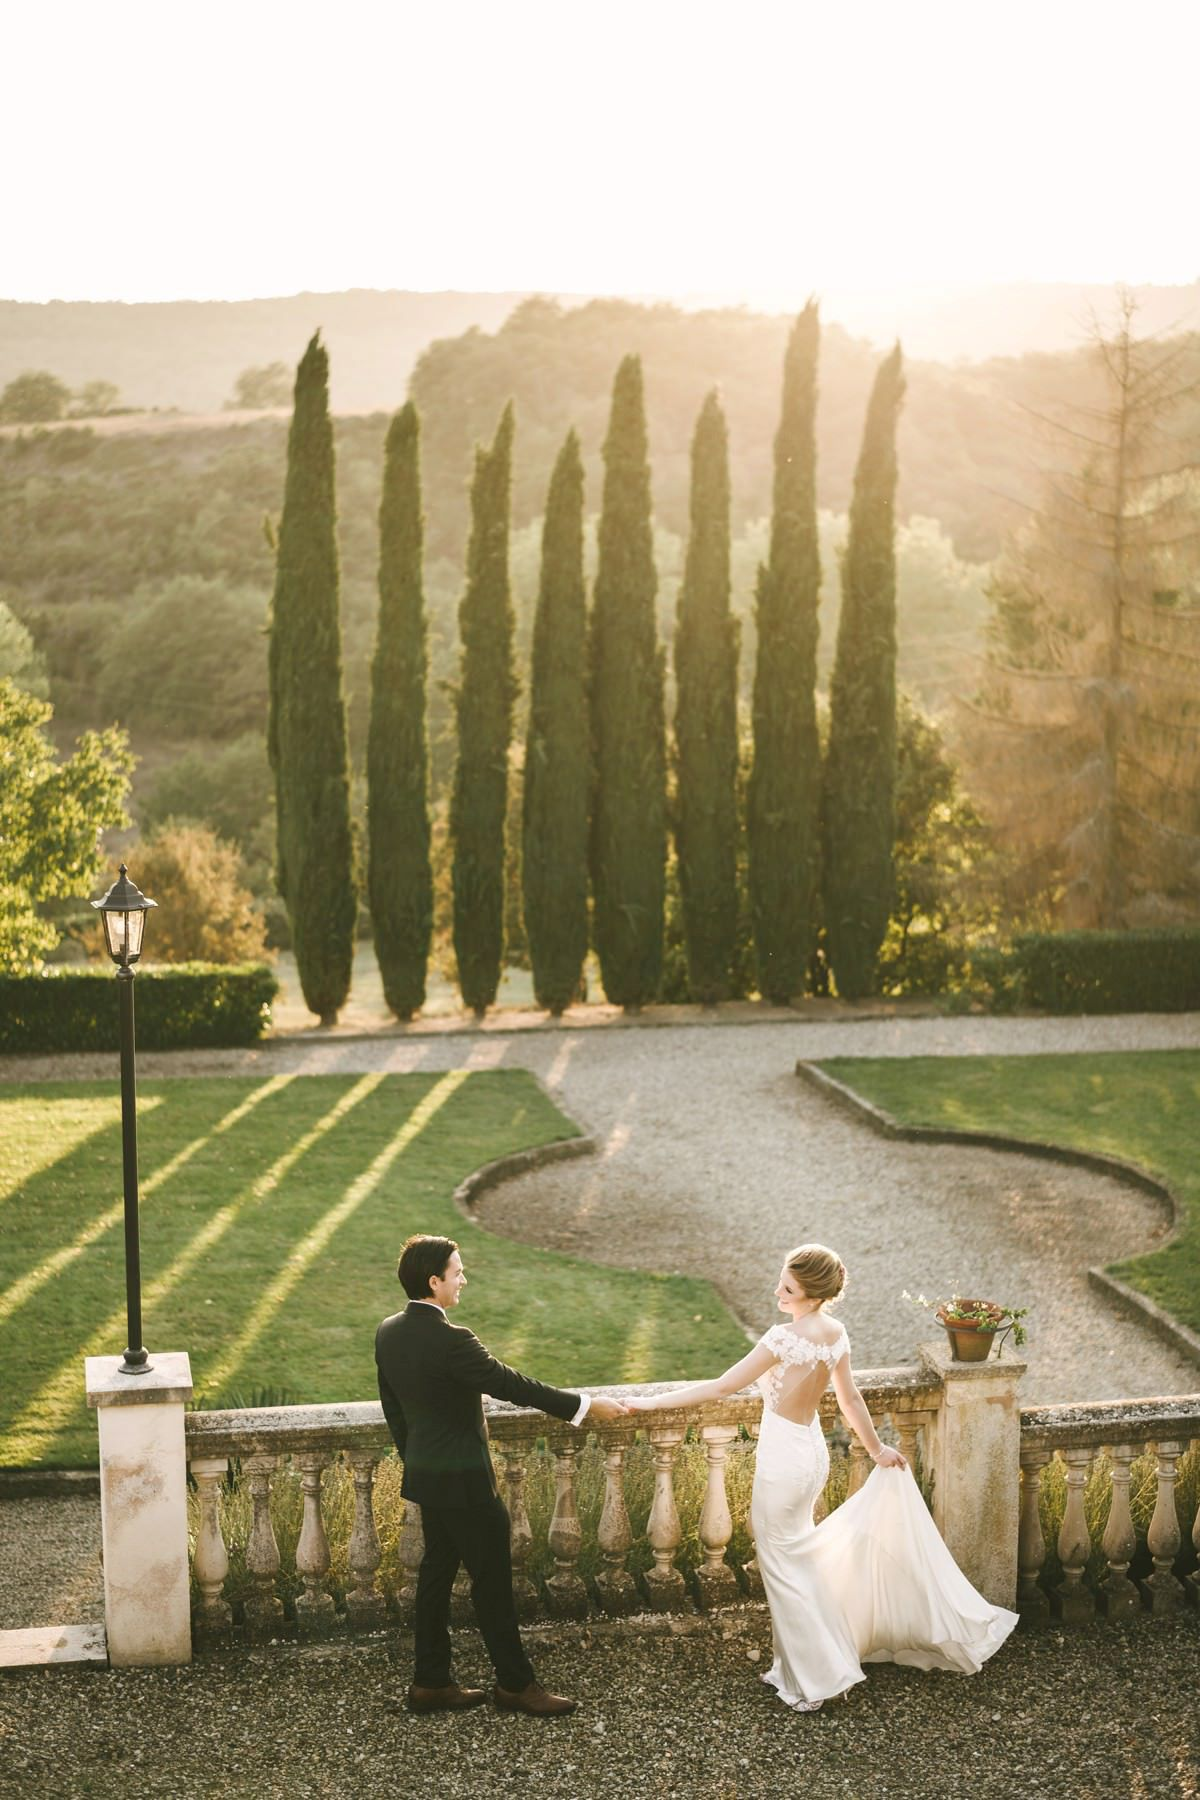 Dreamy Elopement Wedding In Tuscany Villa La Selva Resort In 2020 Tuscany Wedding Elope Wedding Kelly Faetanini Wedding Dresses